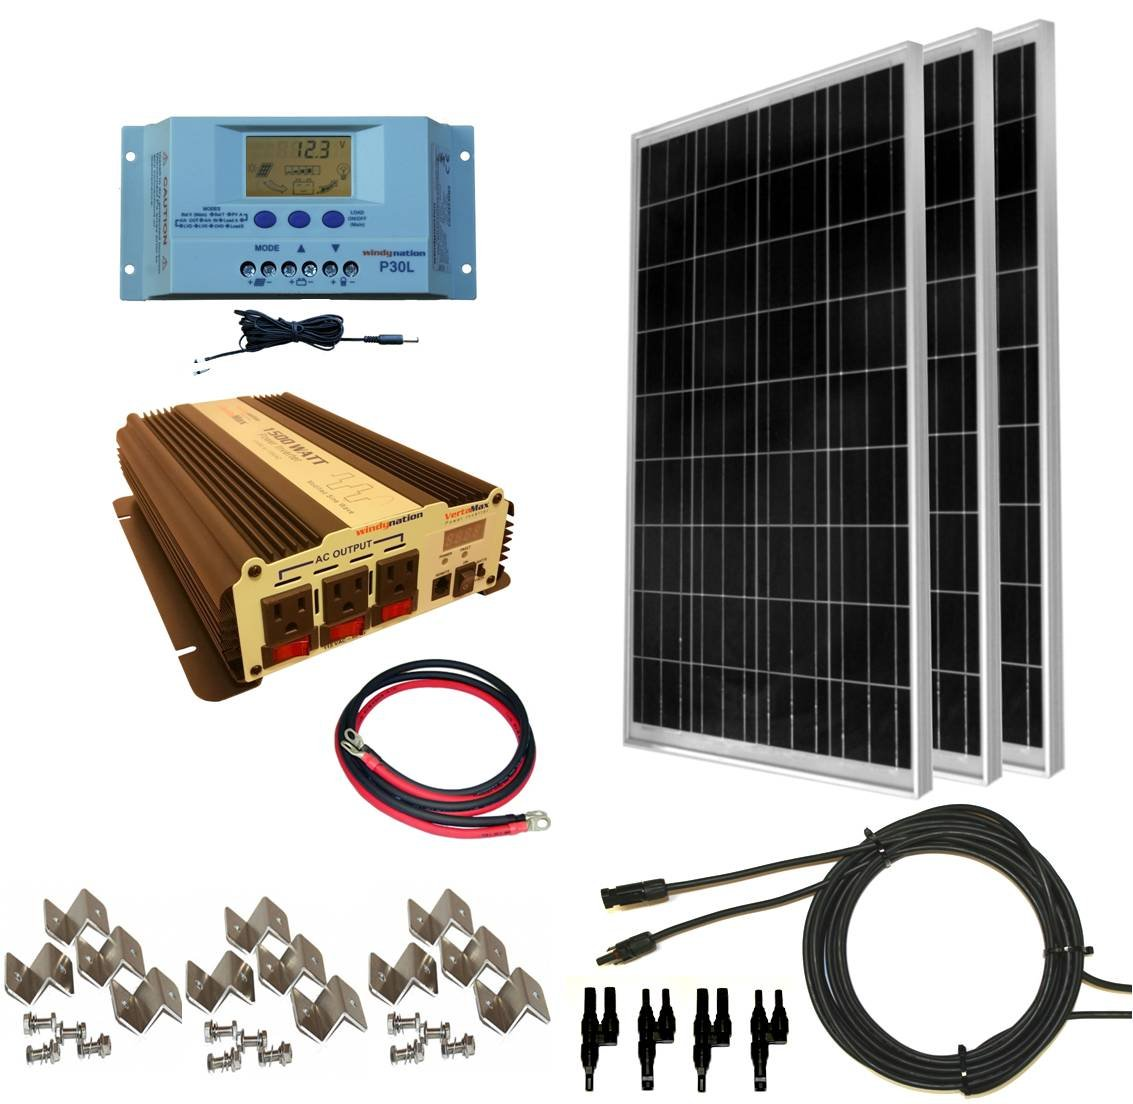 WindyNation 300 Watt (3pcs 100 Watt) Solar Panel Kit with 1500W VertaMax Power Inverter for RV, Boat, Off-Grid 12 Volt Battery Systems